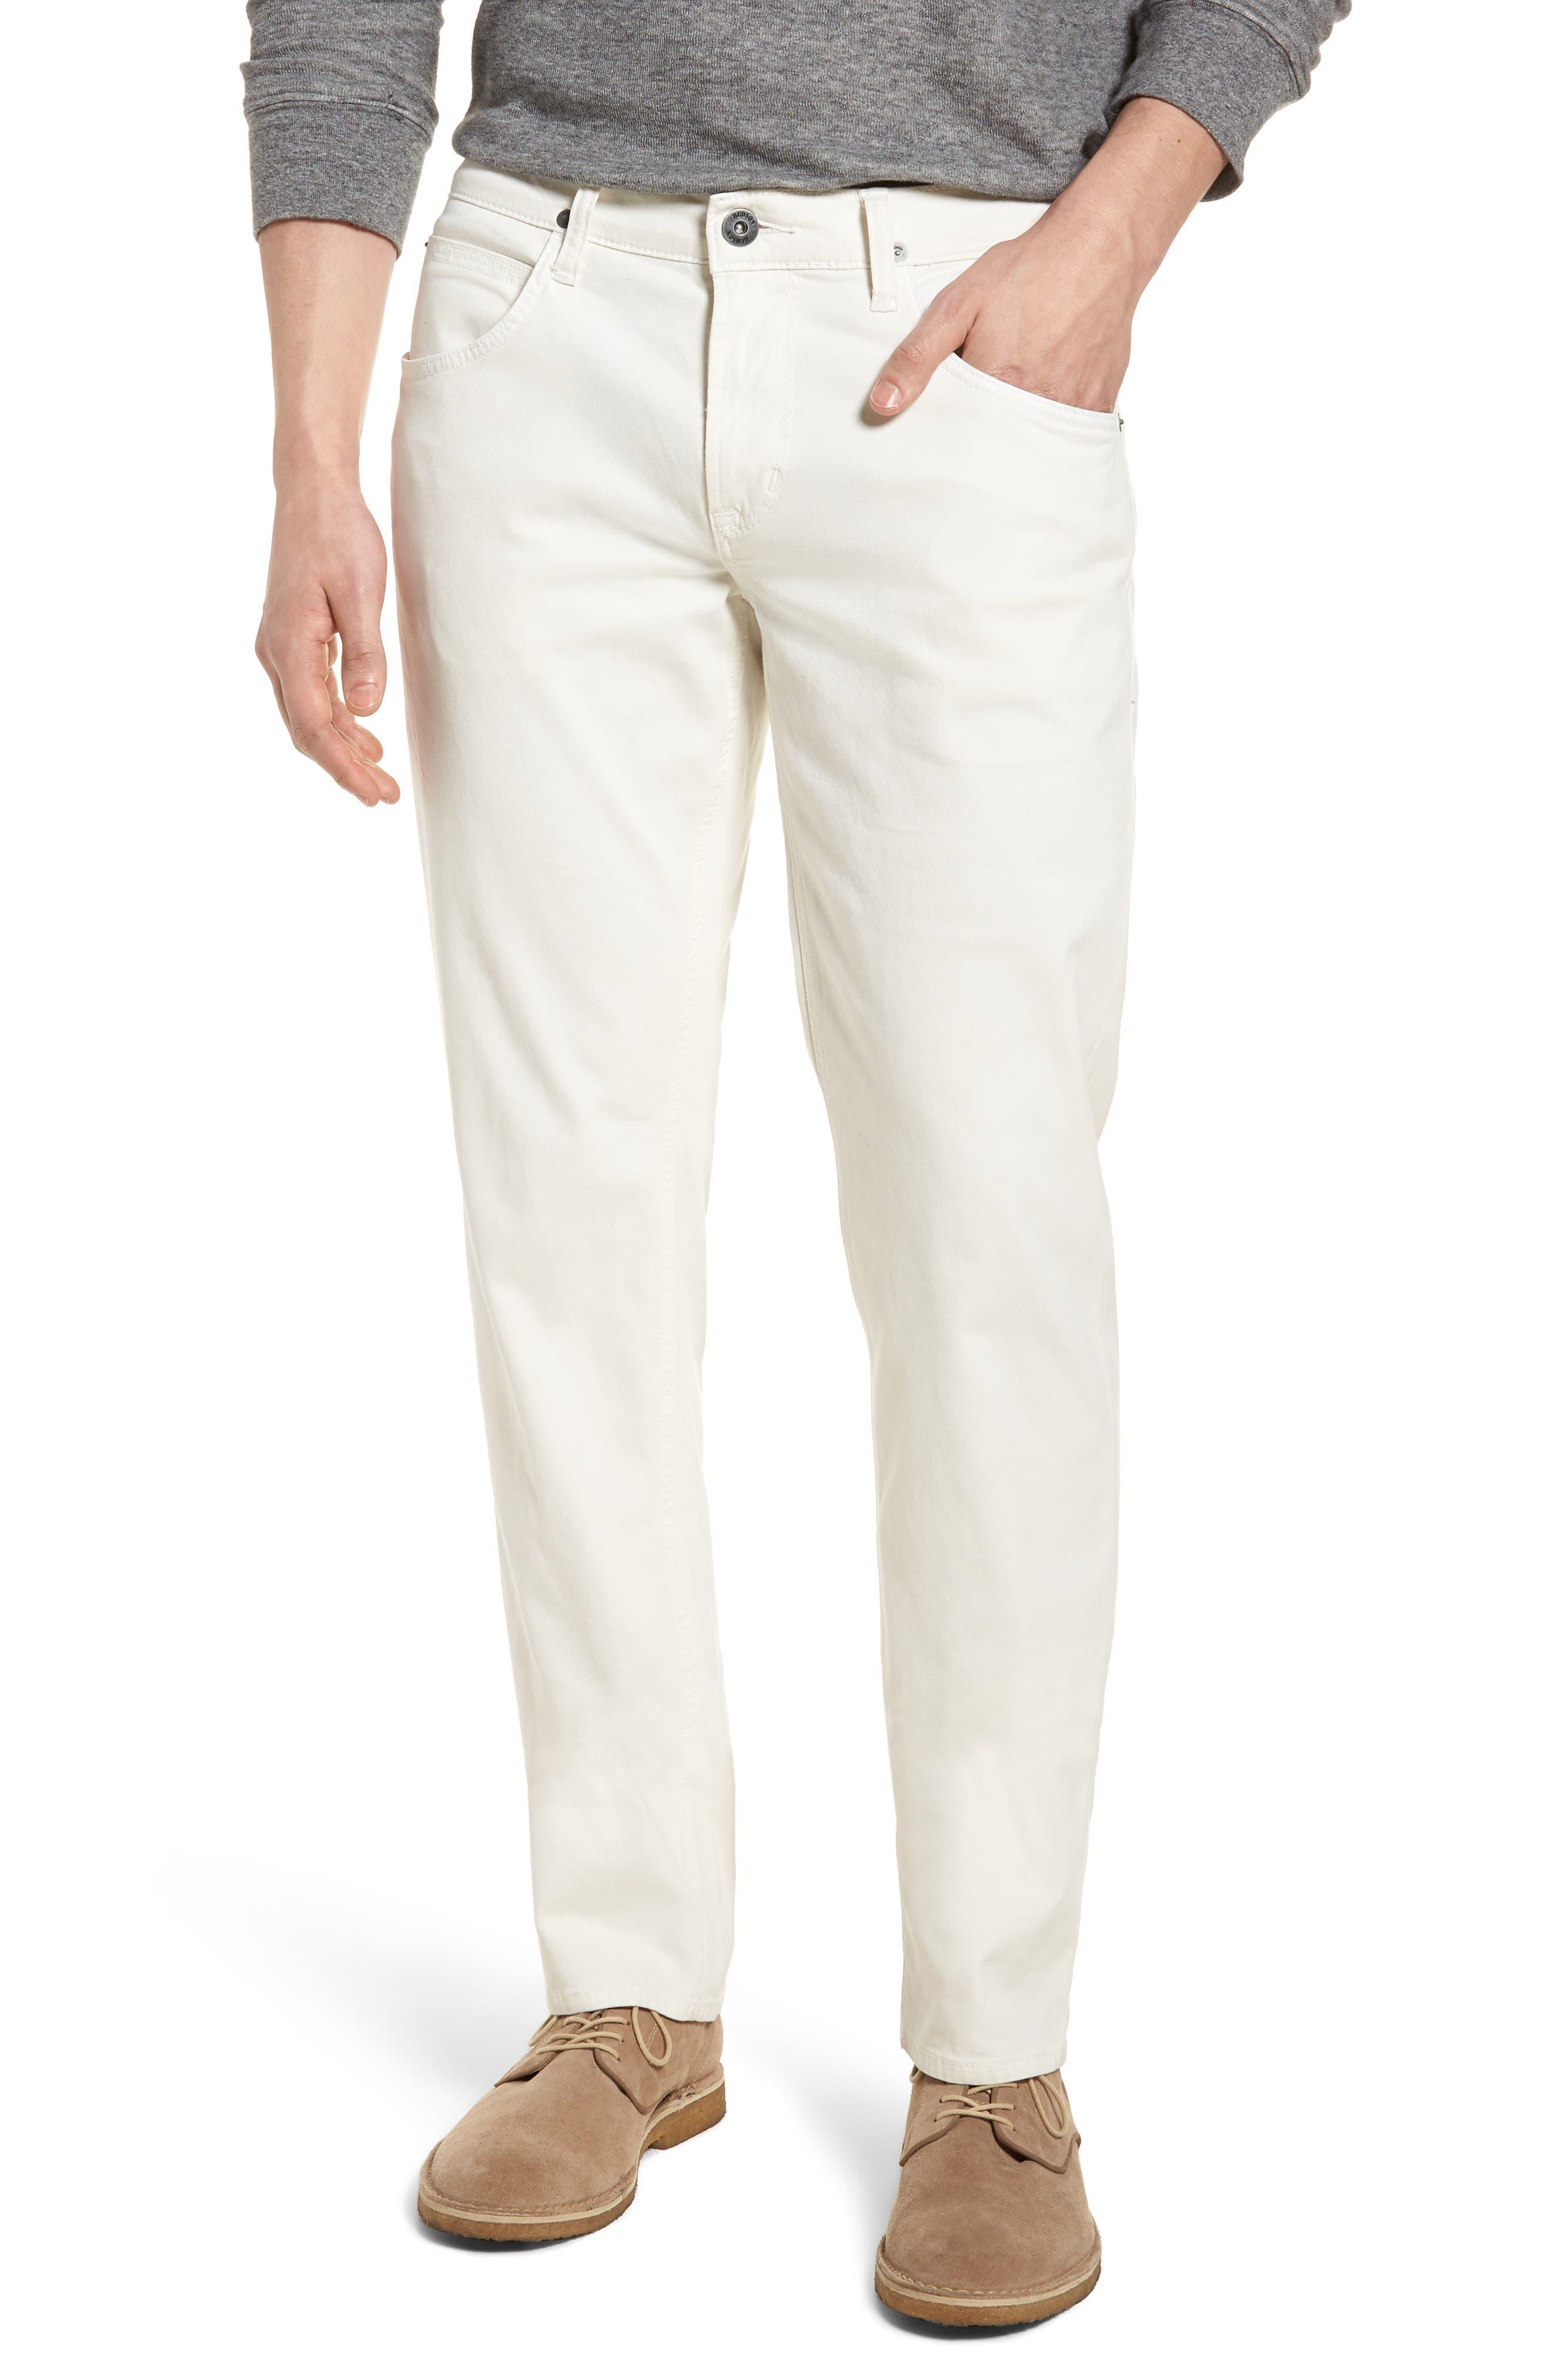 Blake Slim Fit Jeans,                             Main thumbnail 1, color,                             Off White